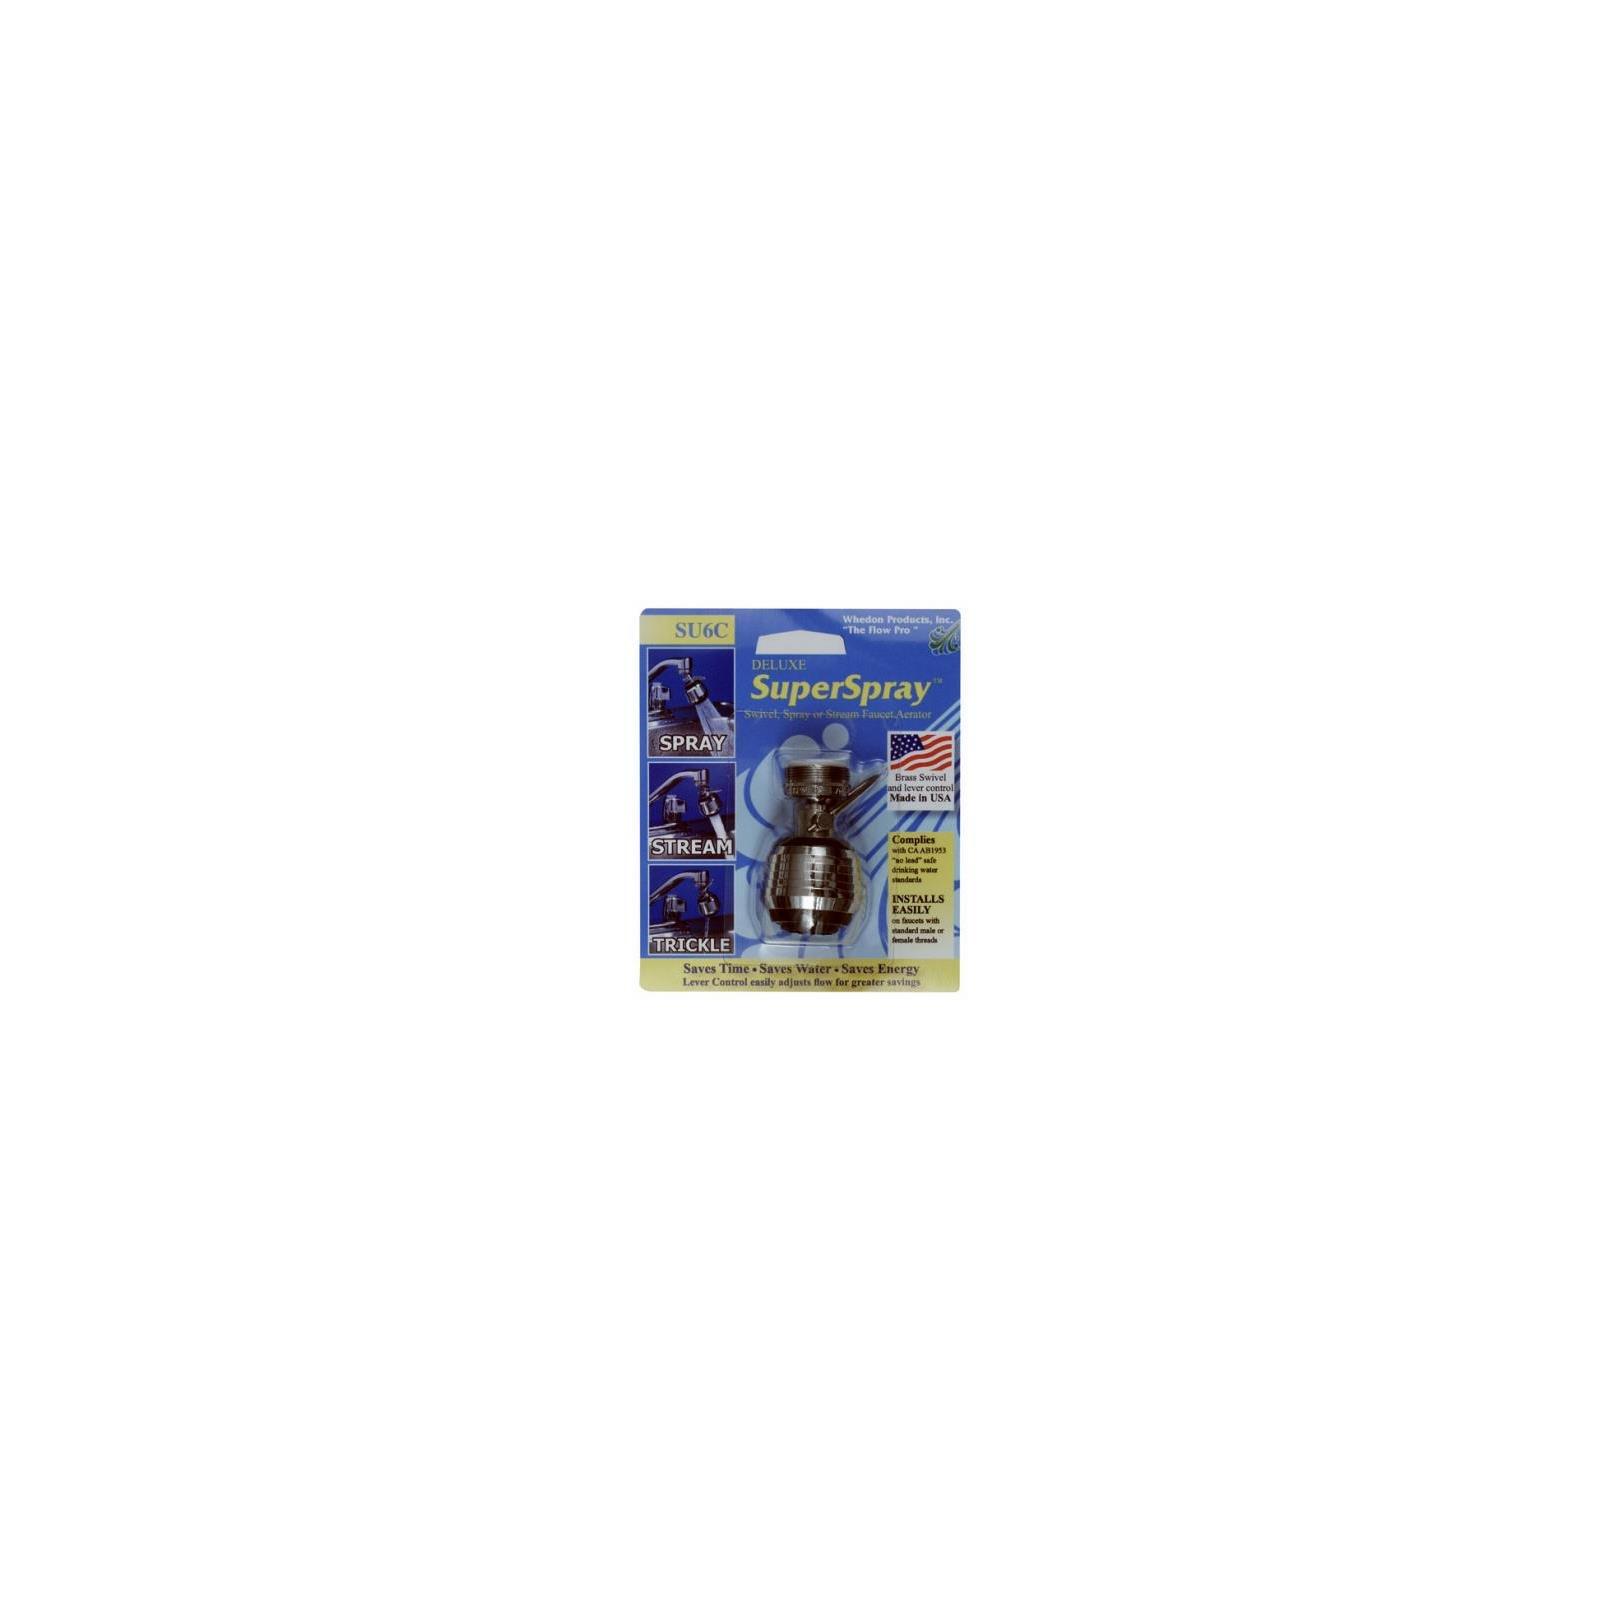 Whedon Products SU6C Deluxe Super Spray & Stream Swivel Aerator with Lever Control, Lead Free - Quantity 8